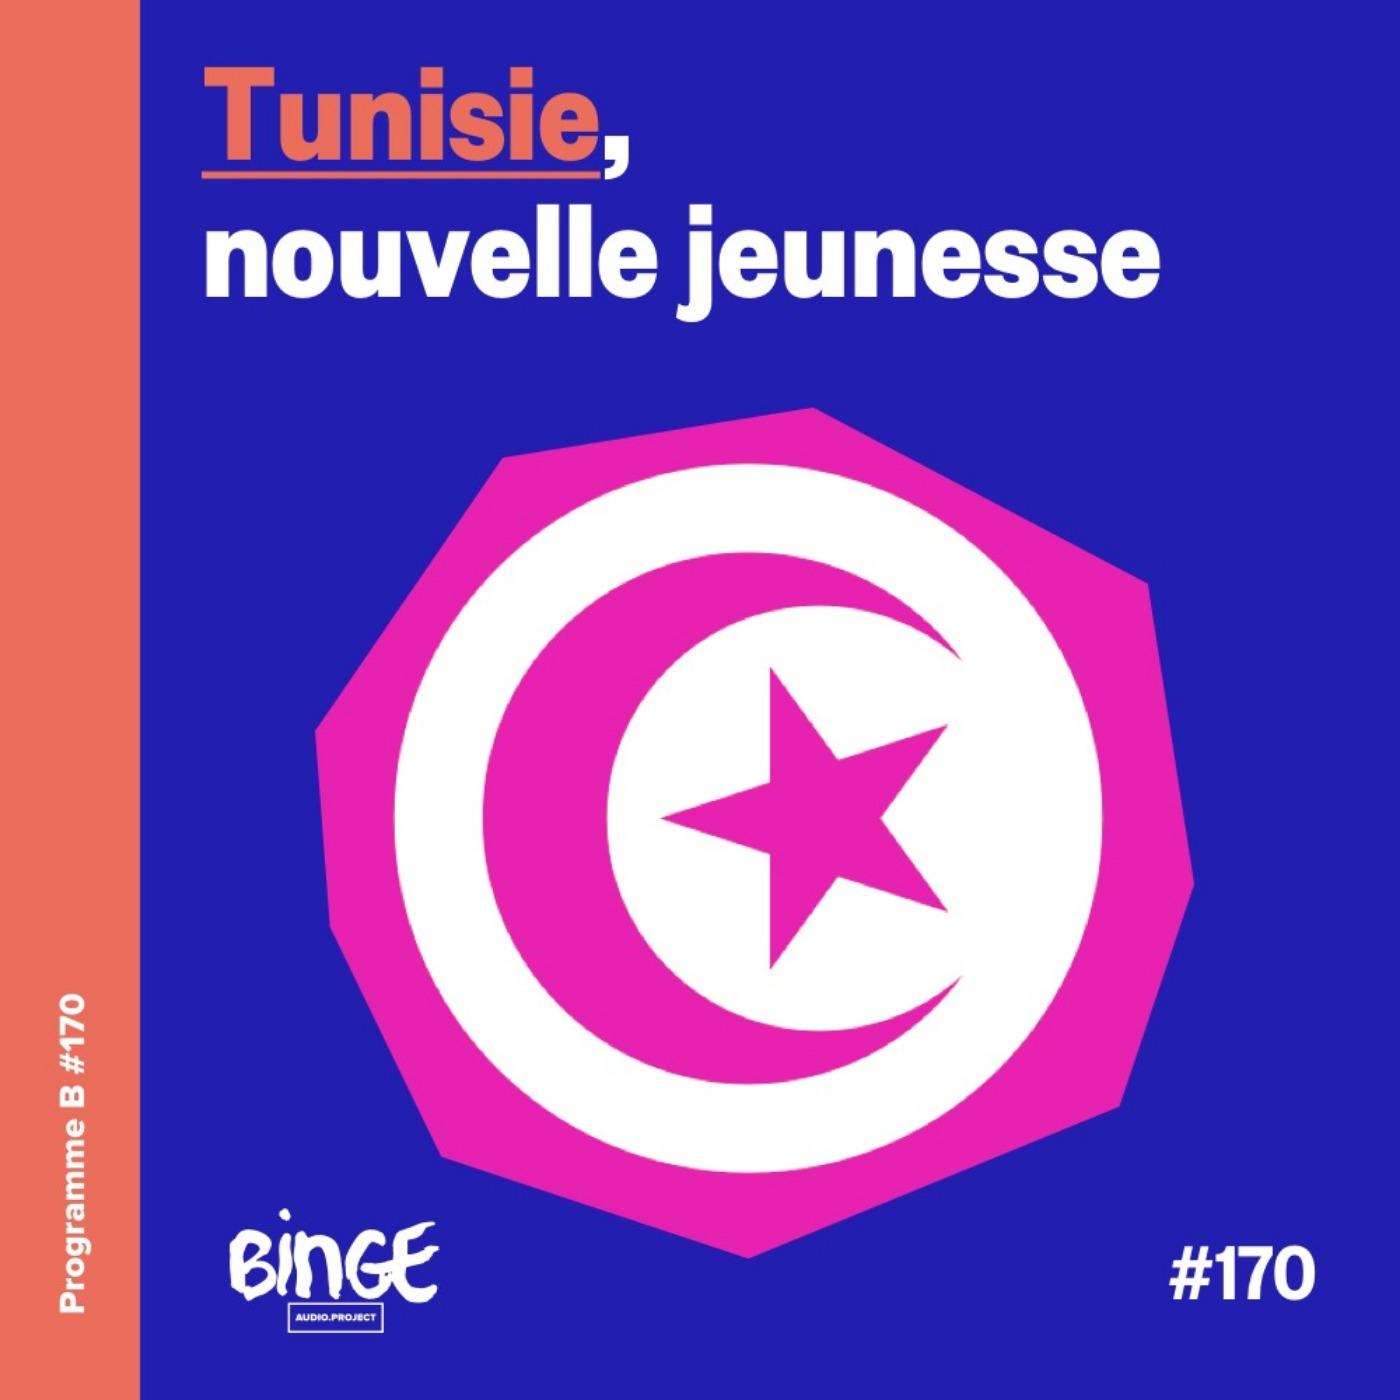 Tunisie, nouvelle jeunesse